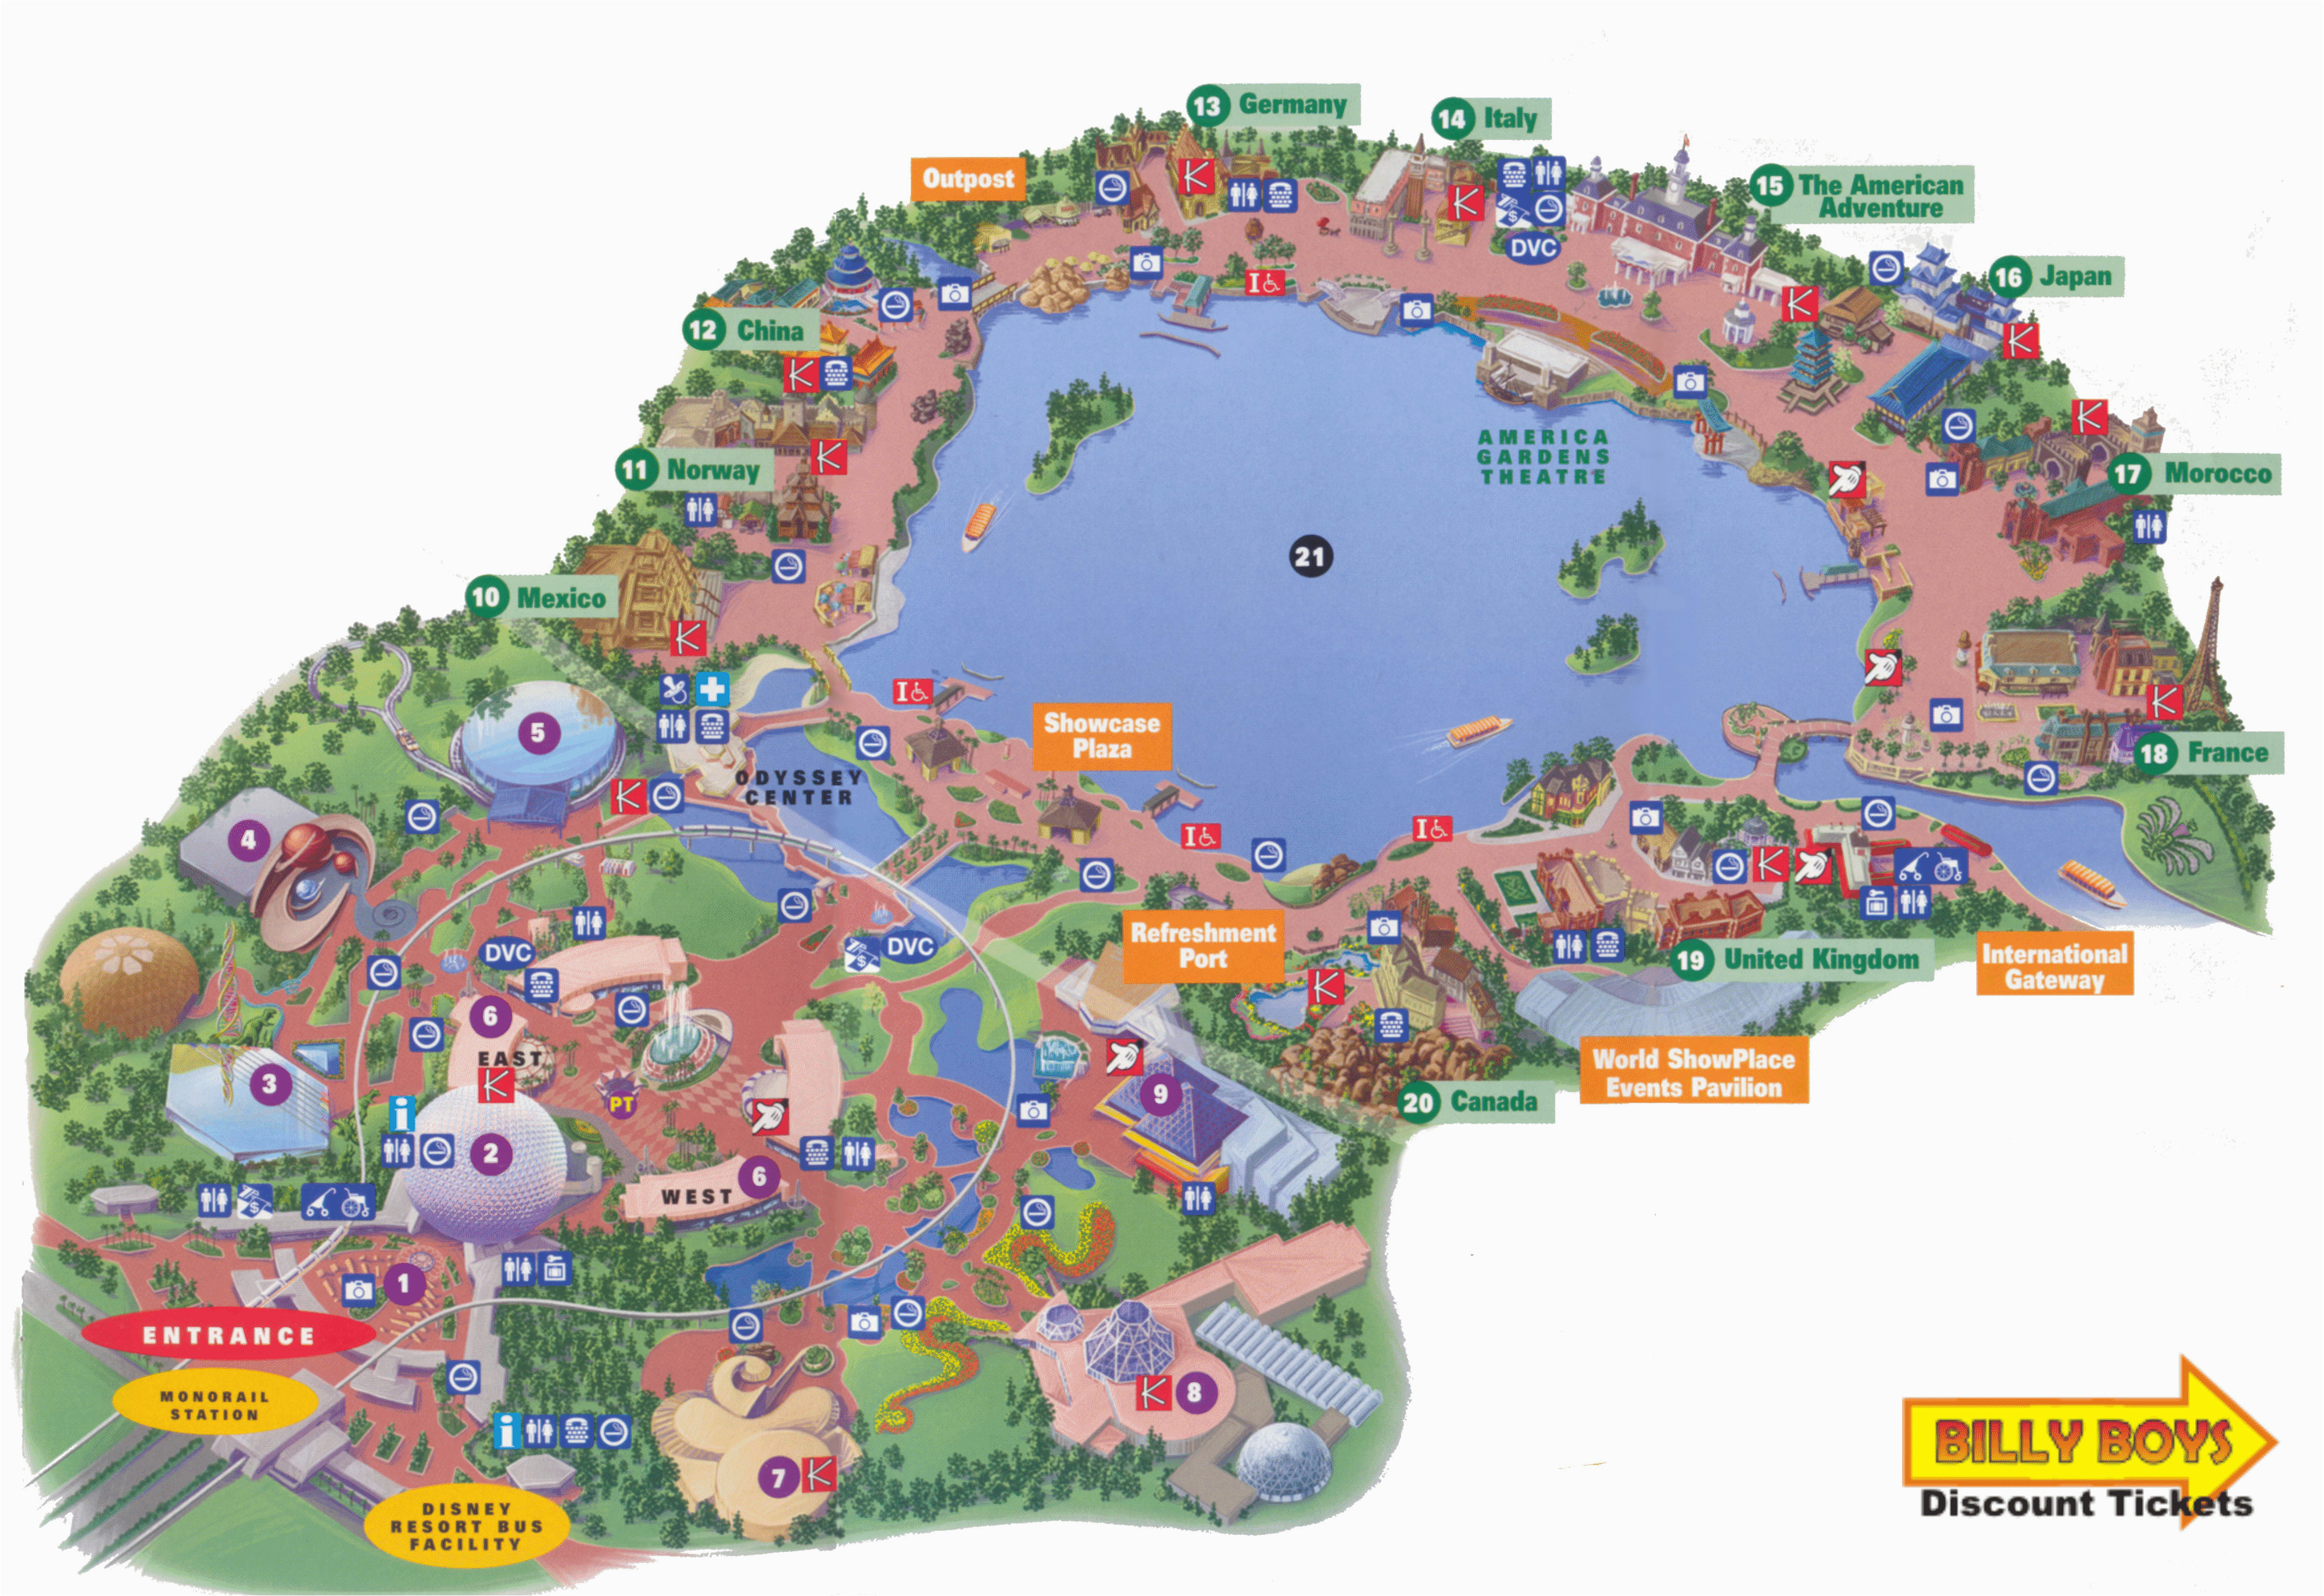 California Adventure Rides Map Printable Map Disneyland and California Adventure Free Printable